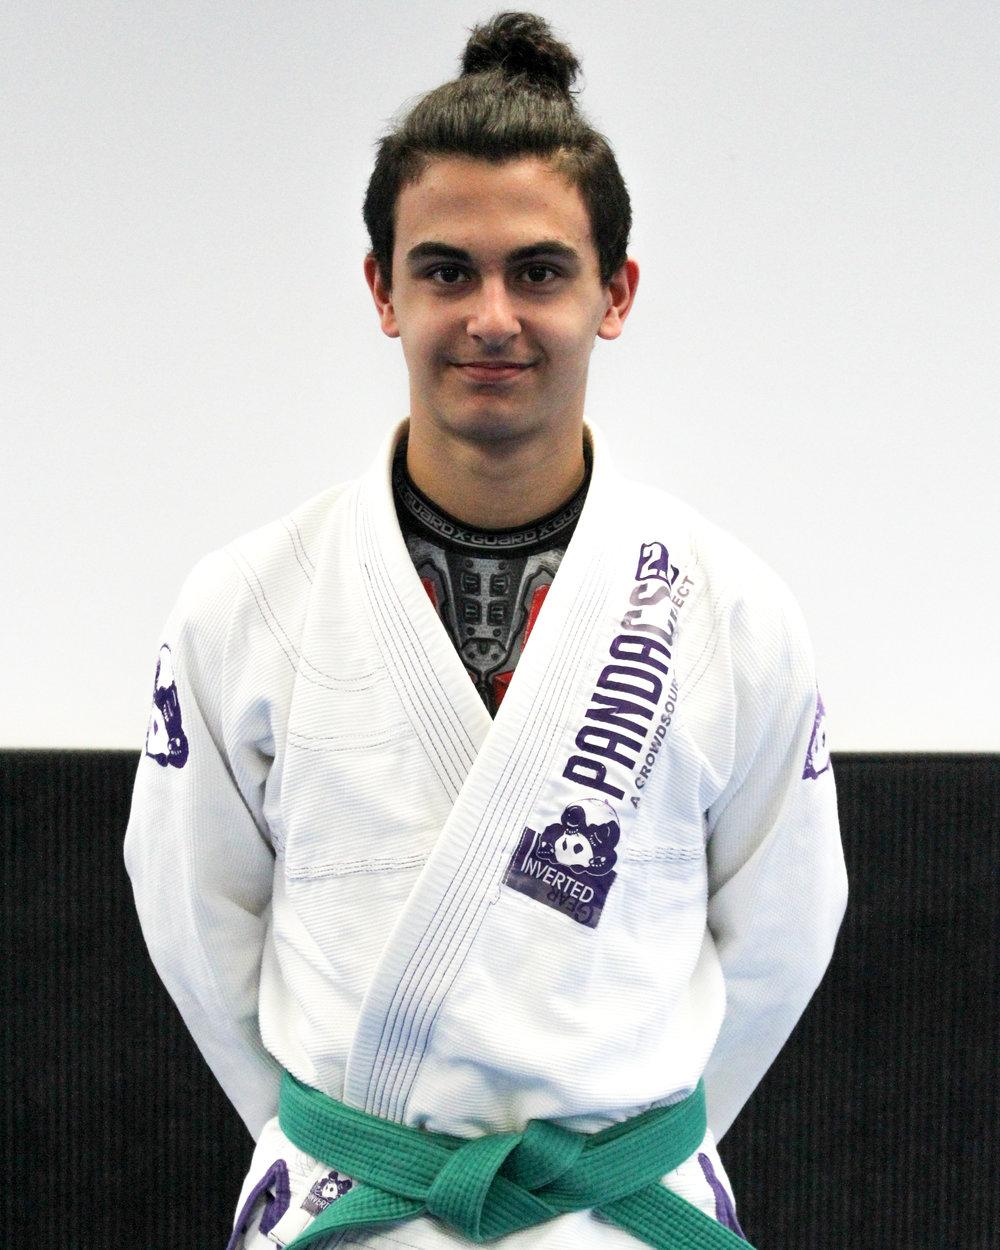 Coach Adrian Sadeghi